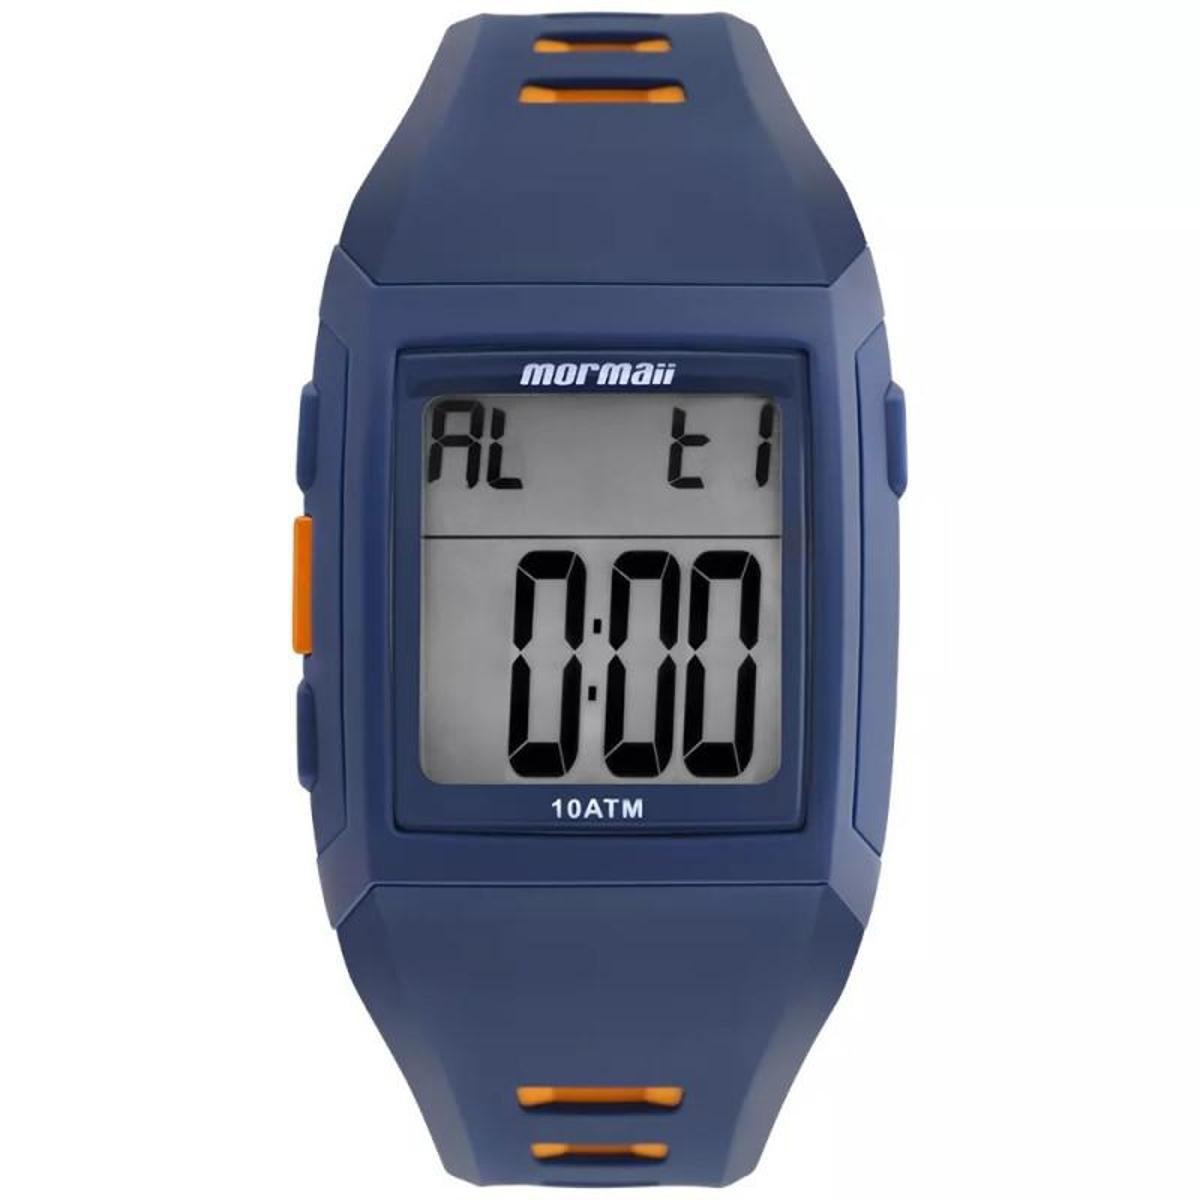 9600fad7526 Relógio Mormaii Digital Action MO967AA8P Preto Amarelo - Azul e Laranja - Compre  Agora